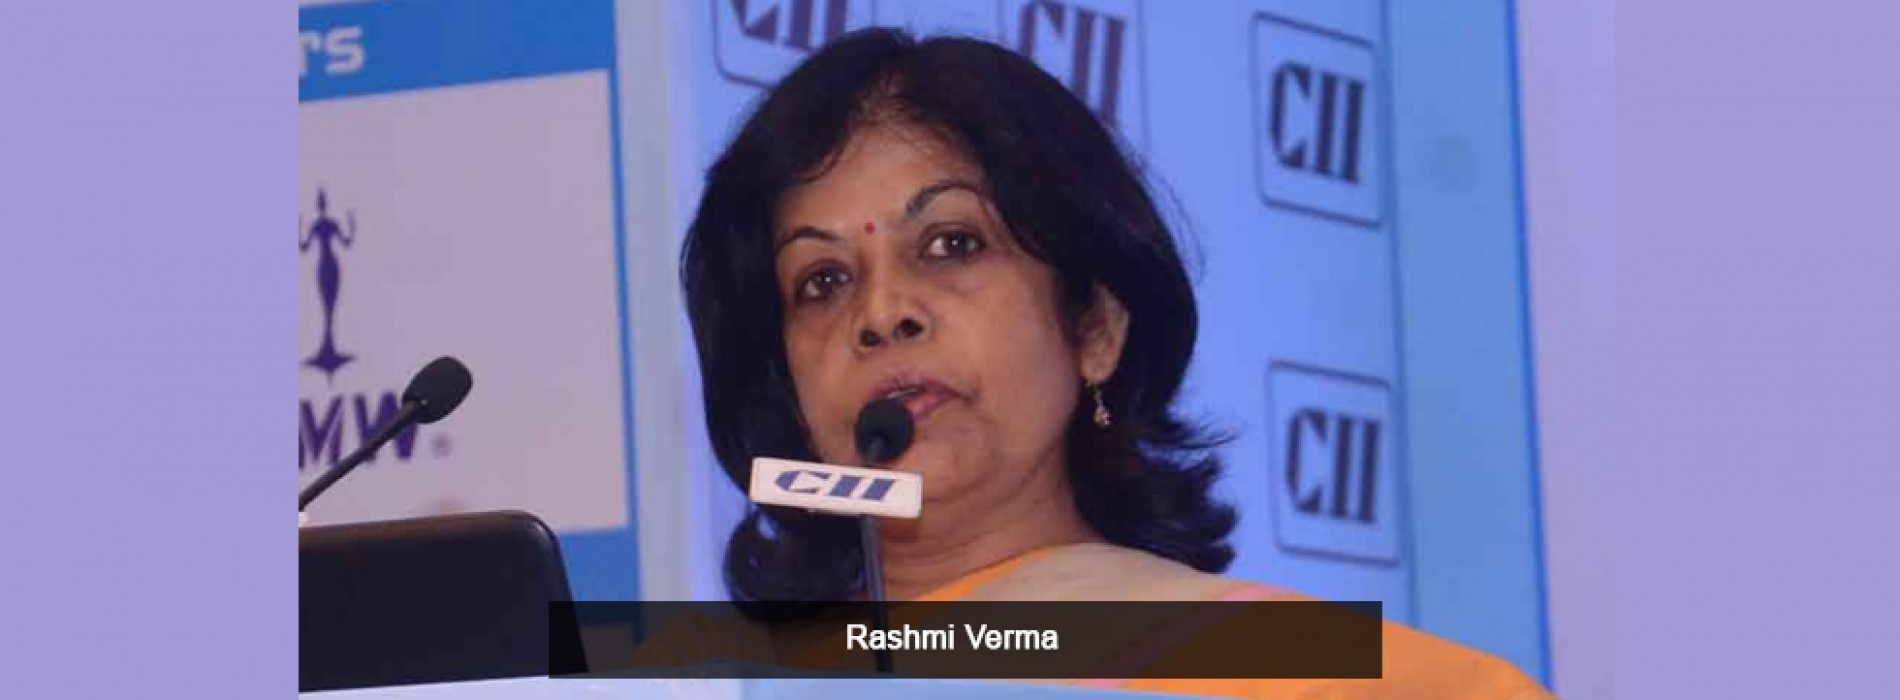 Rashmi Verma is the new Tourism Secretary to Government of India